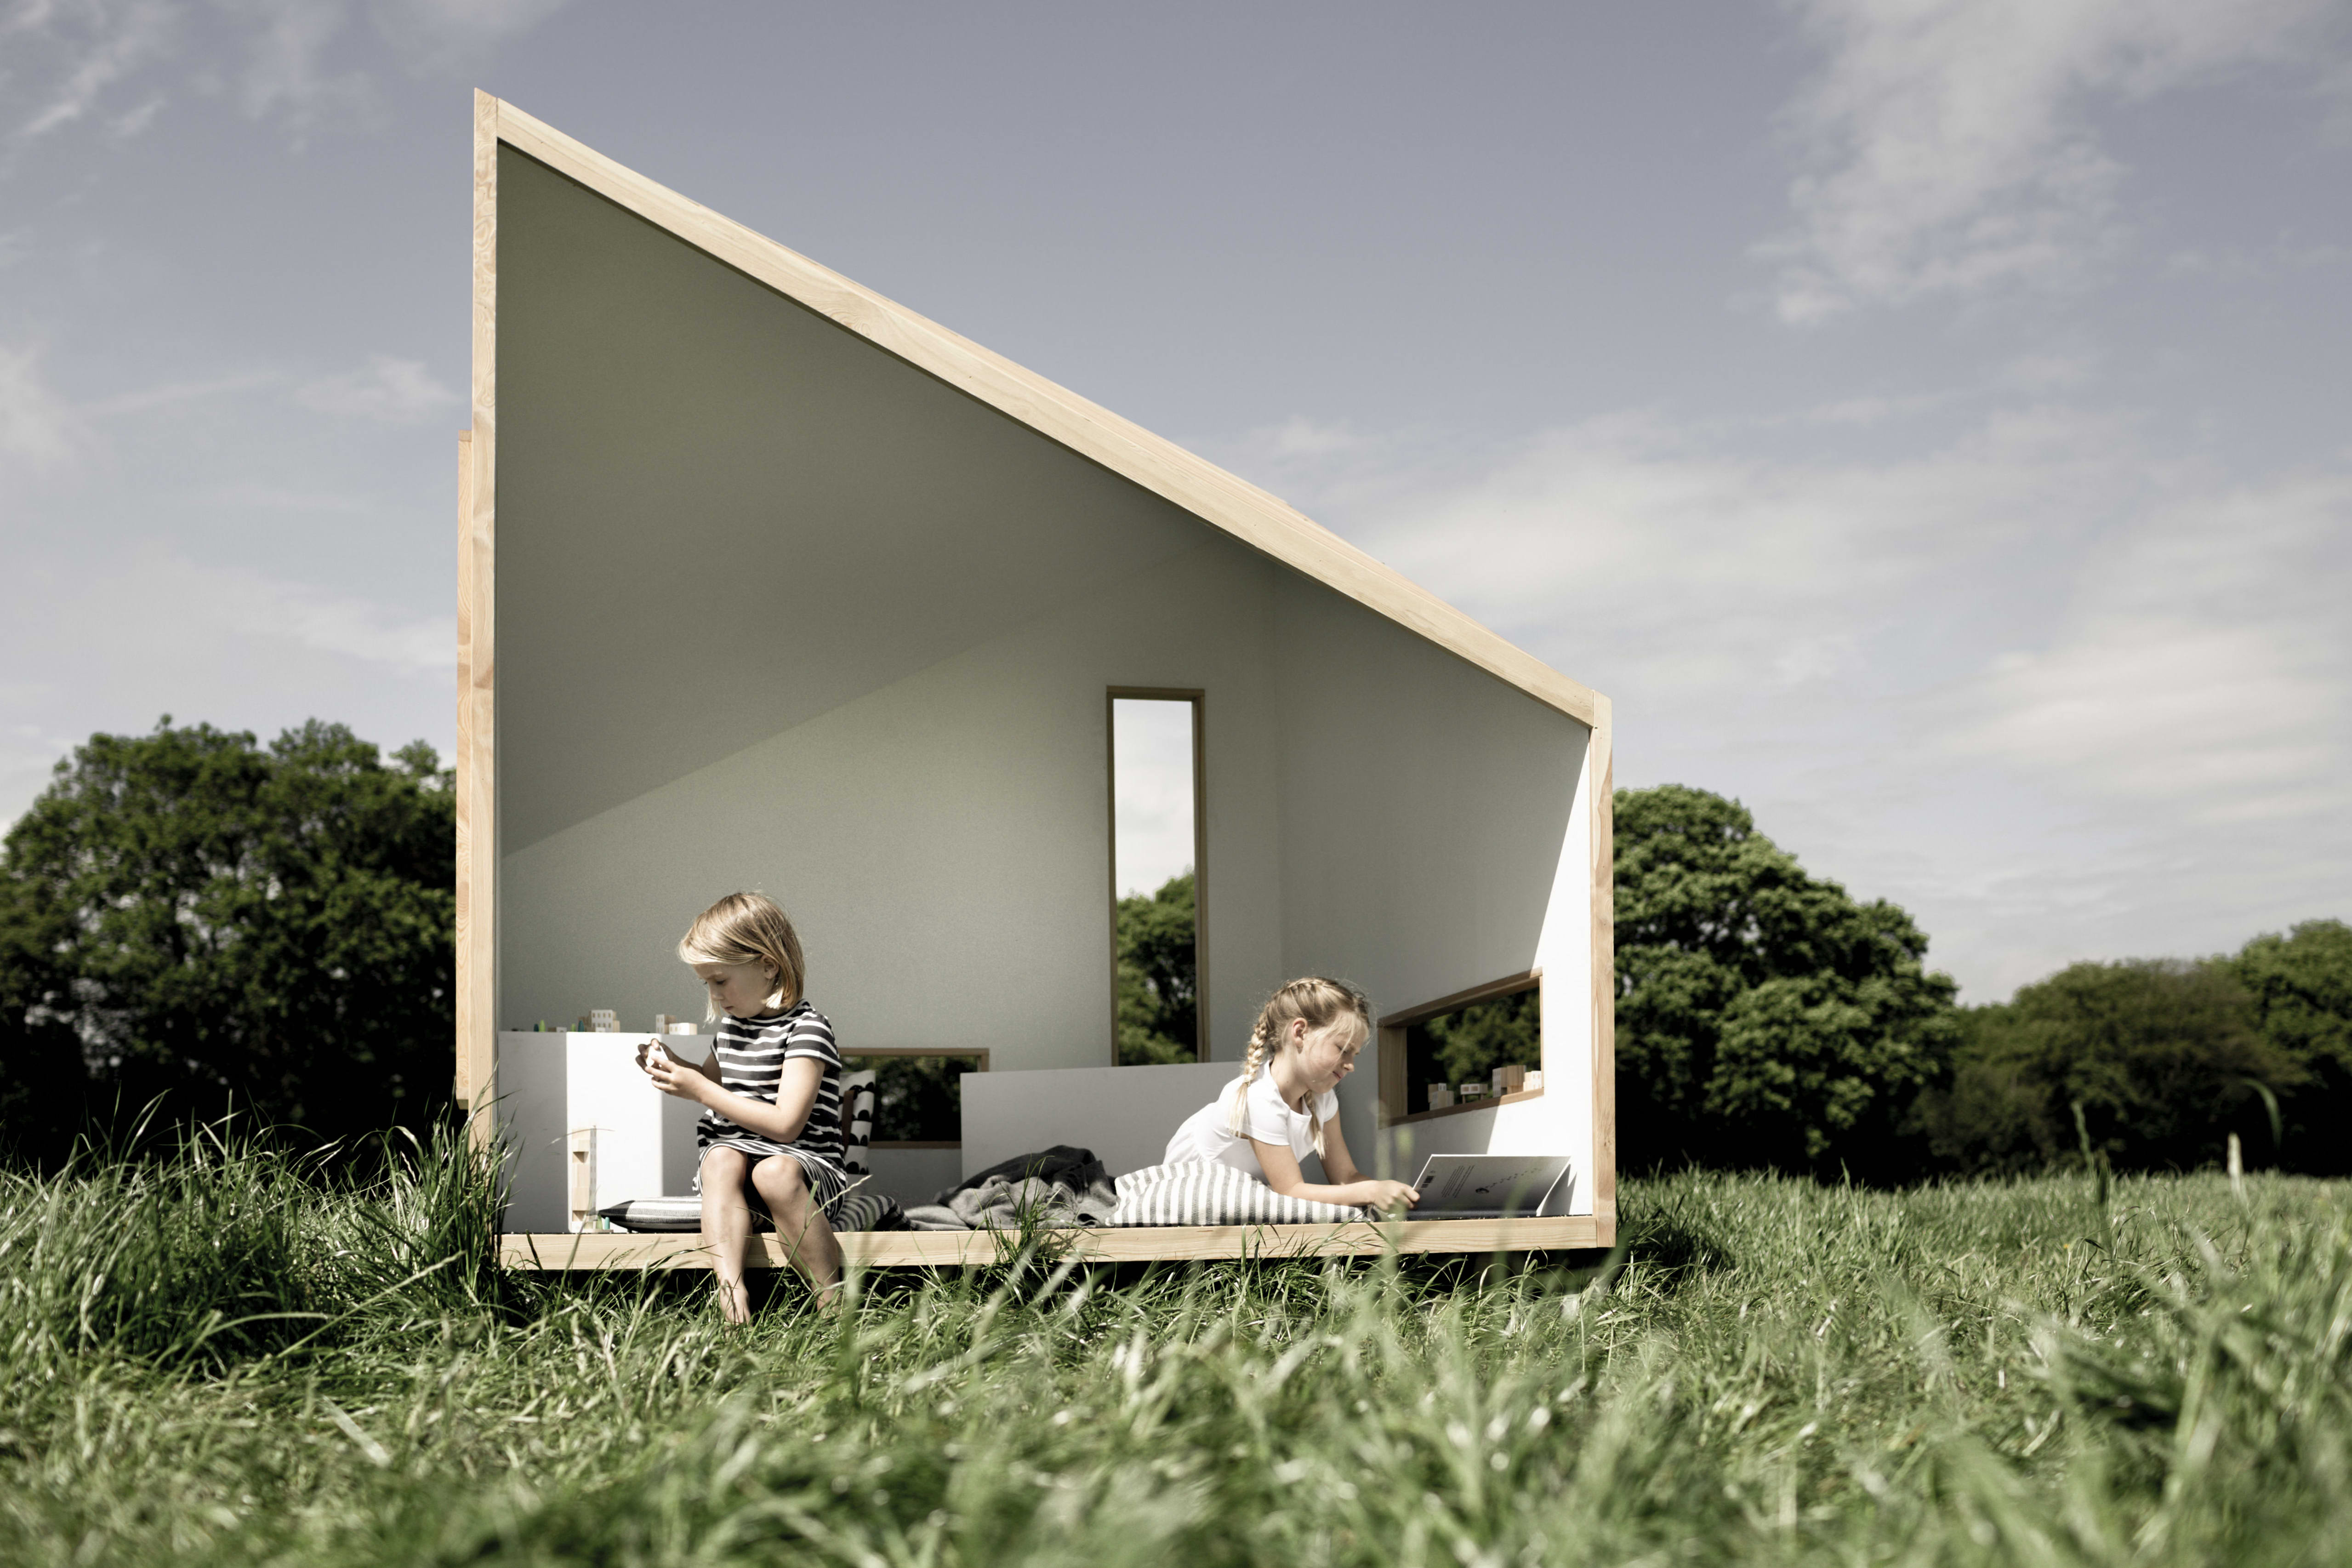 Tiny House Scandinavian Playhouse Koto | Apartment Therapy